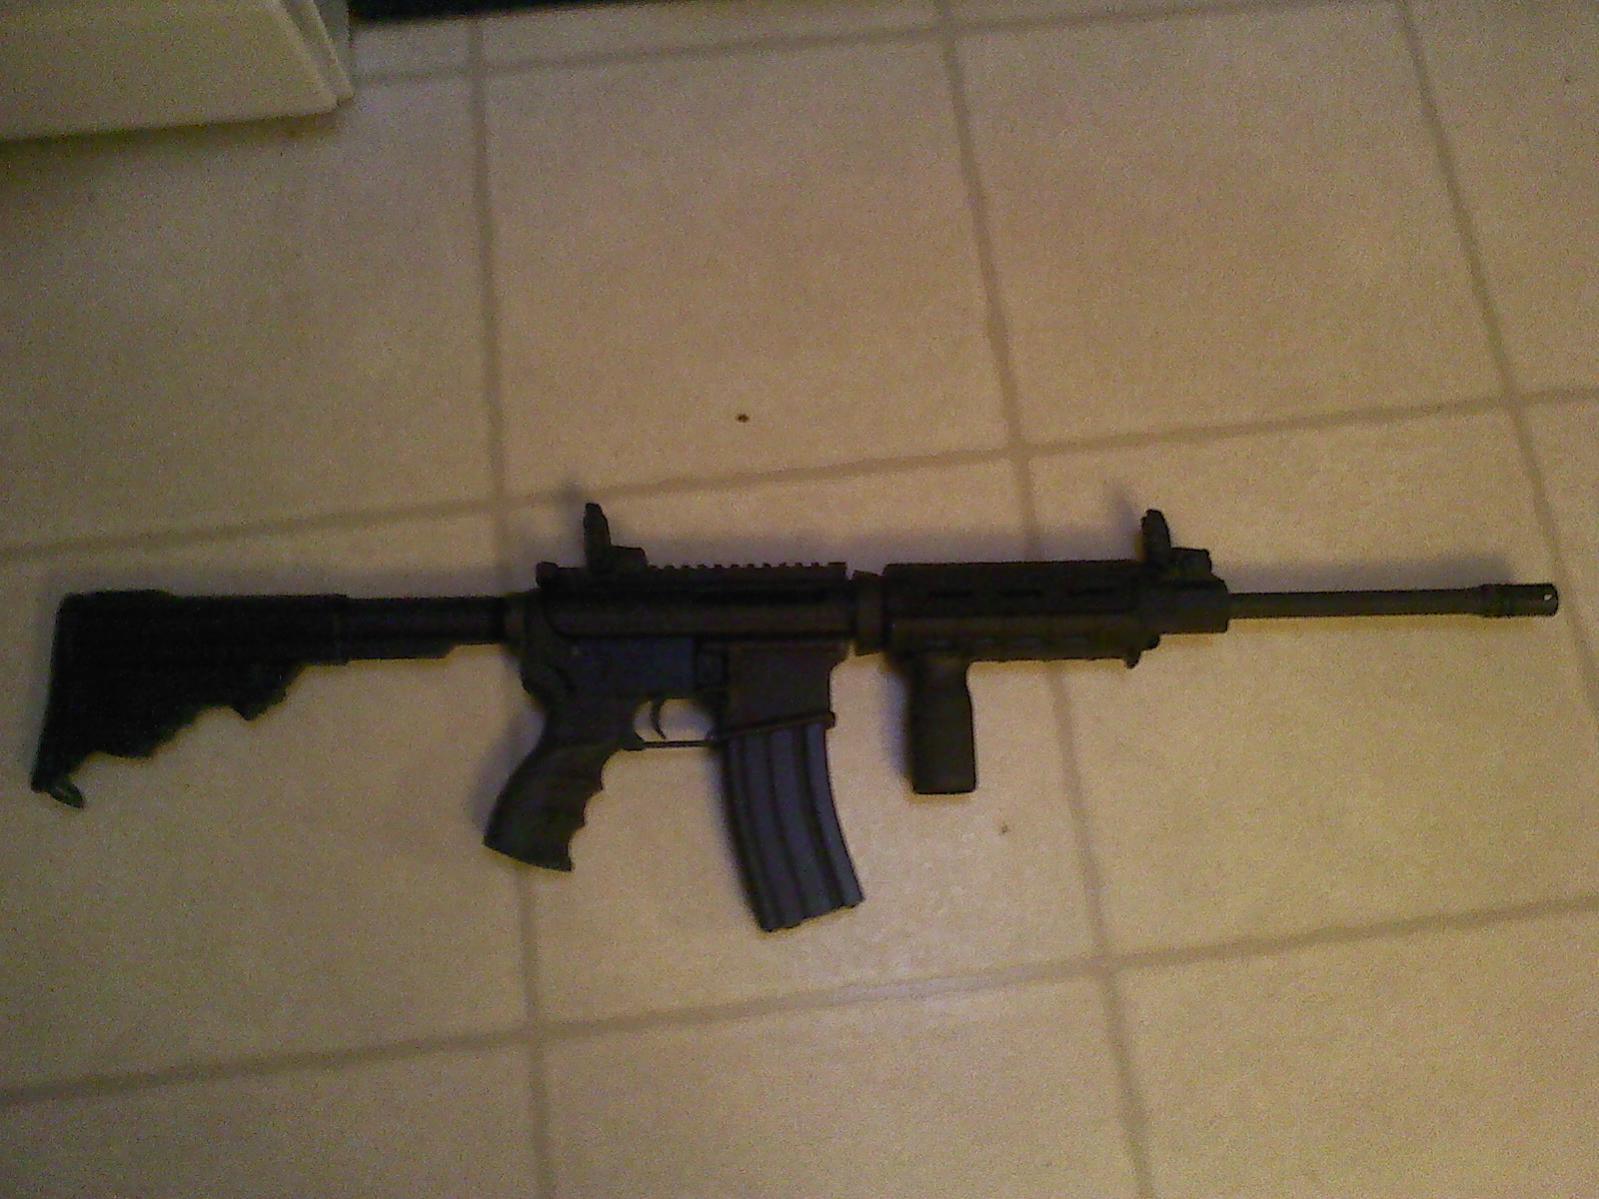 moving rear flip up sight forward on m4 carbine-0125121715.jpg